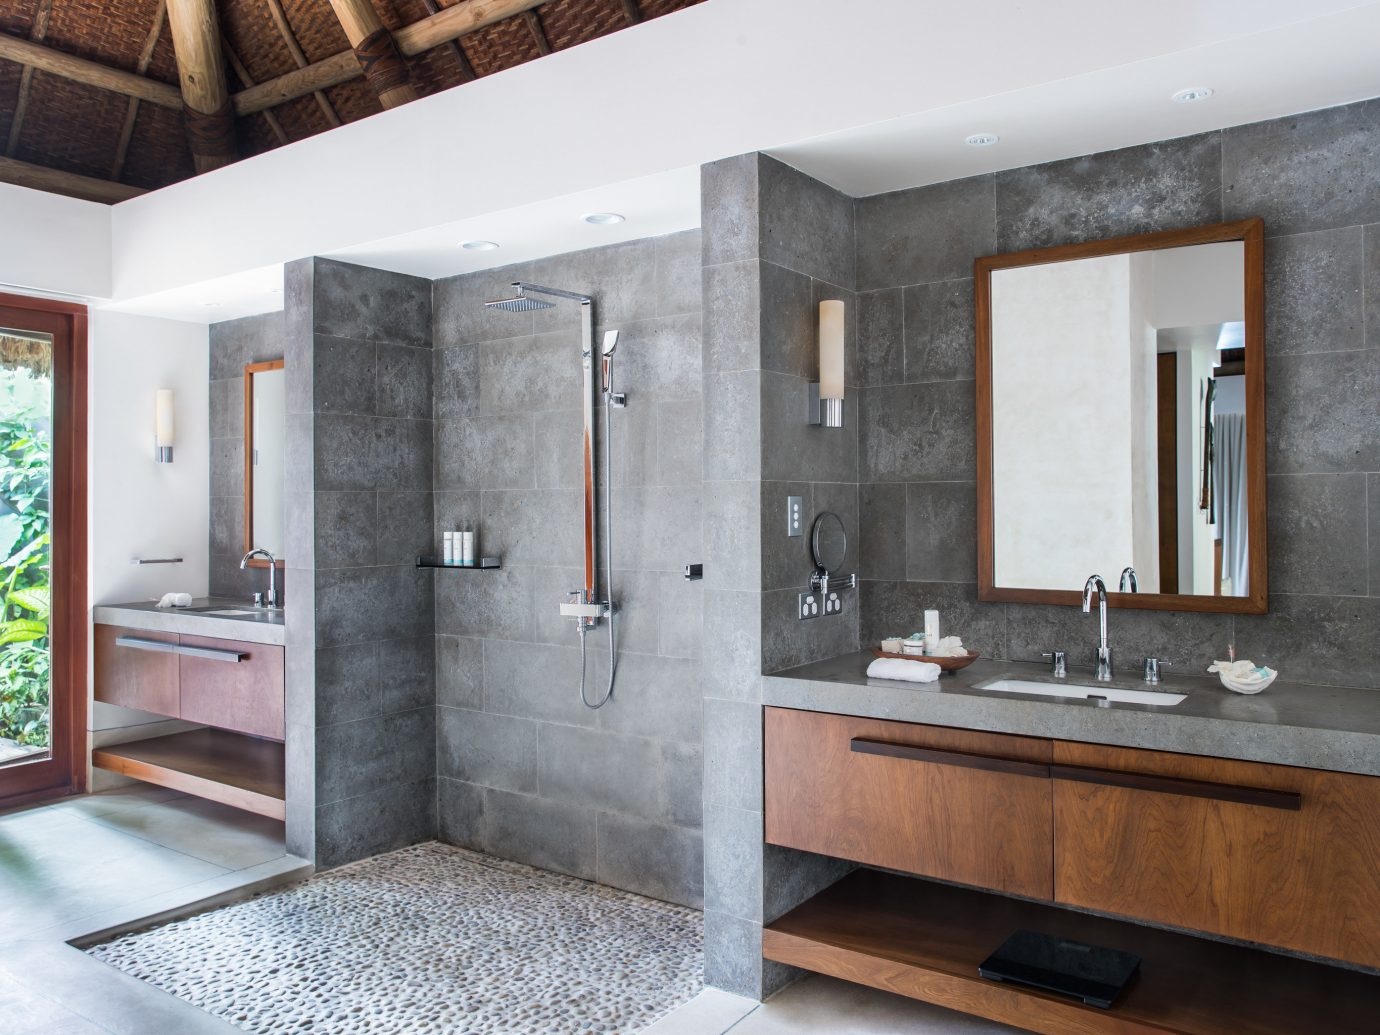 All-Inclusive Resorts Hotels Luxury Travel indoor floor wall bathroom ceiling room interior design sink interior designer plumbing fixture Modern tub Bath bathtub stone